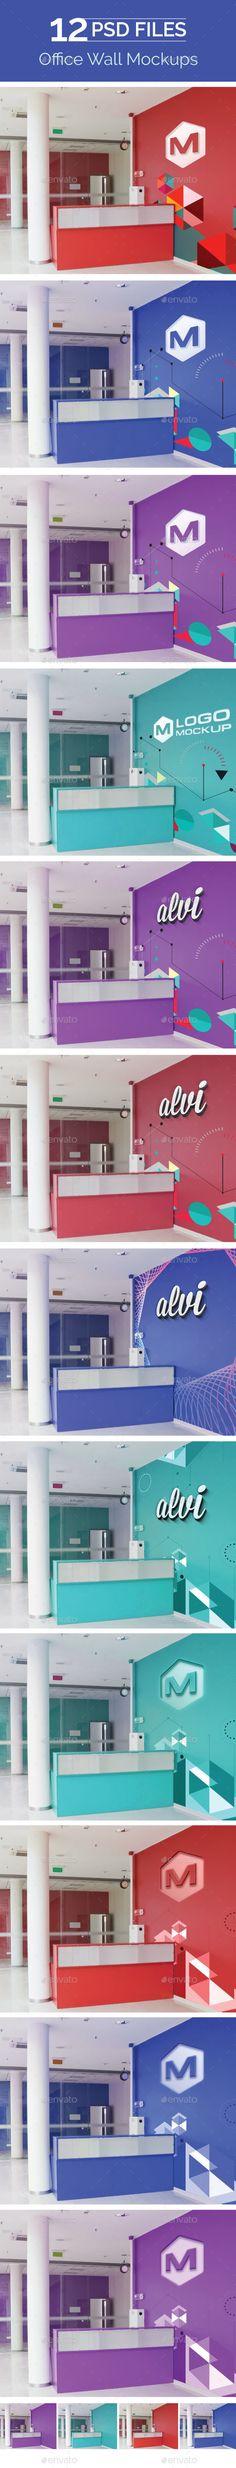 Office Wall Mock Up - Logo Product #Mock-Ups